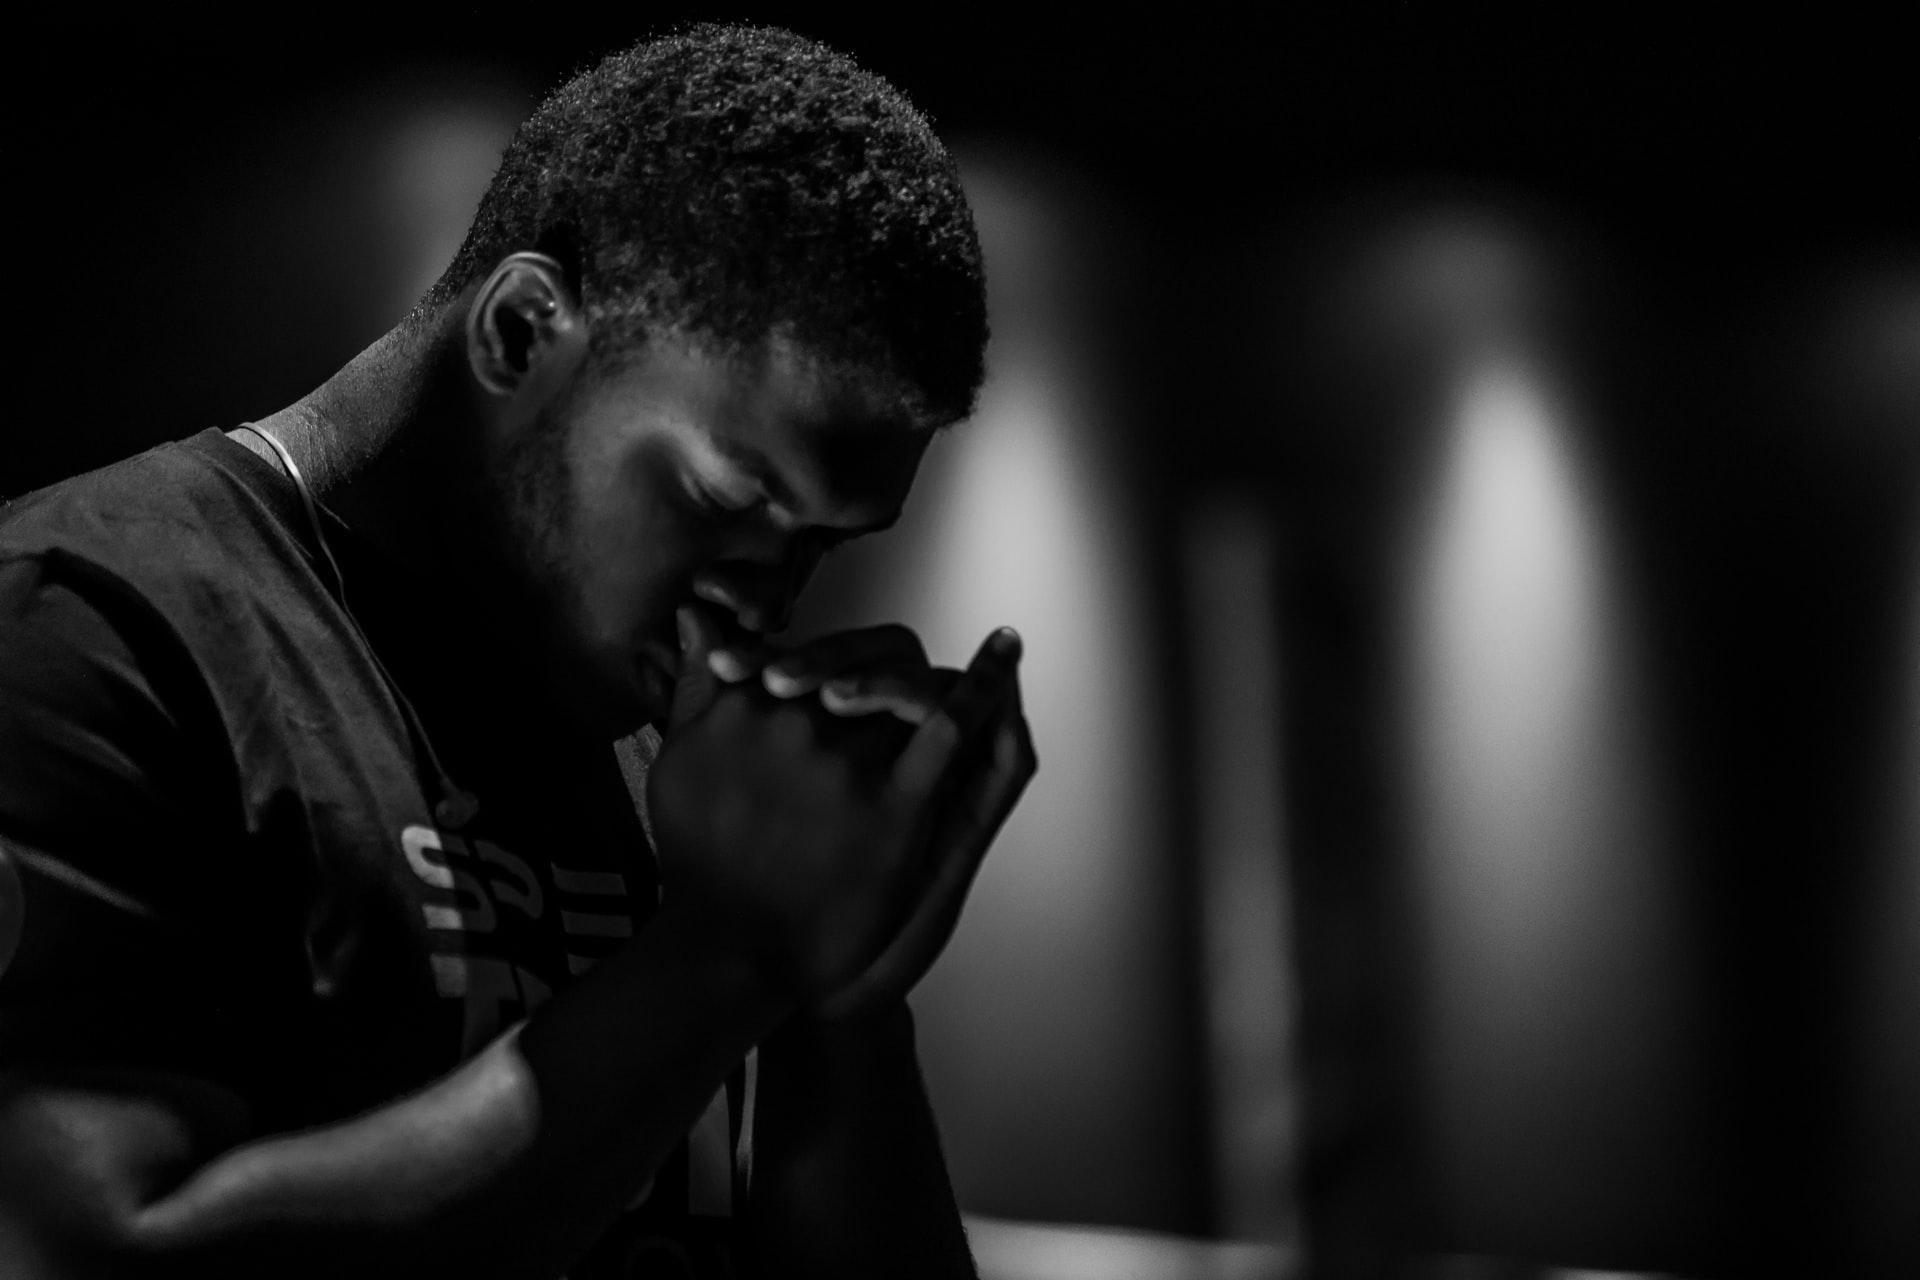 A Prayer for Evangelism